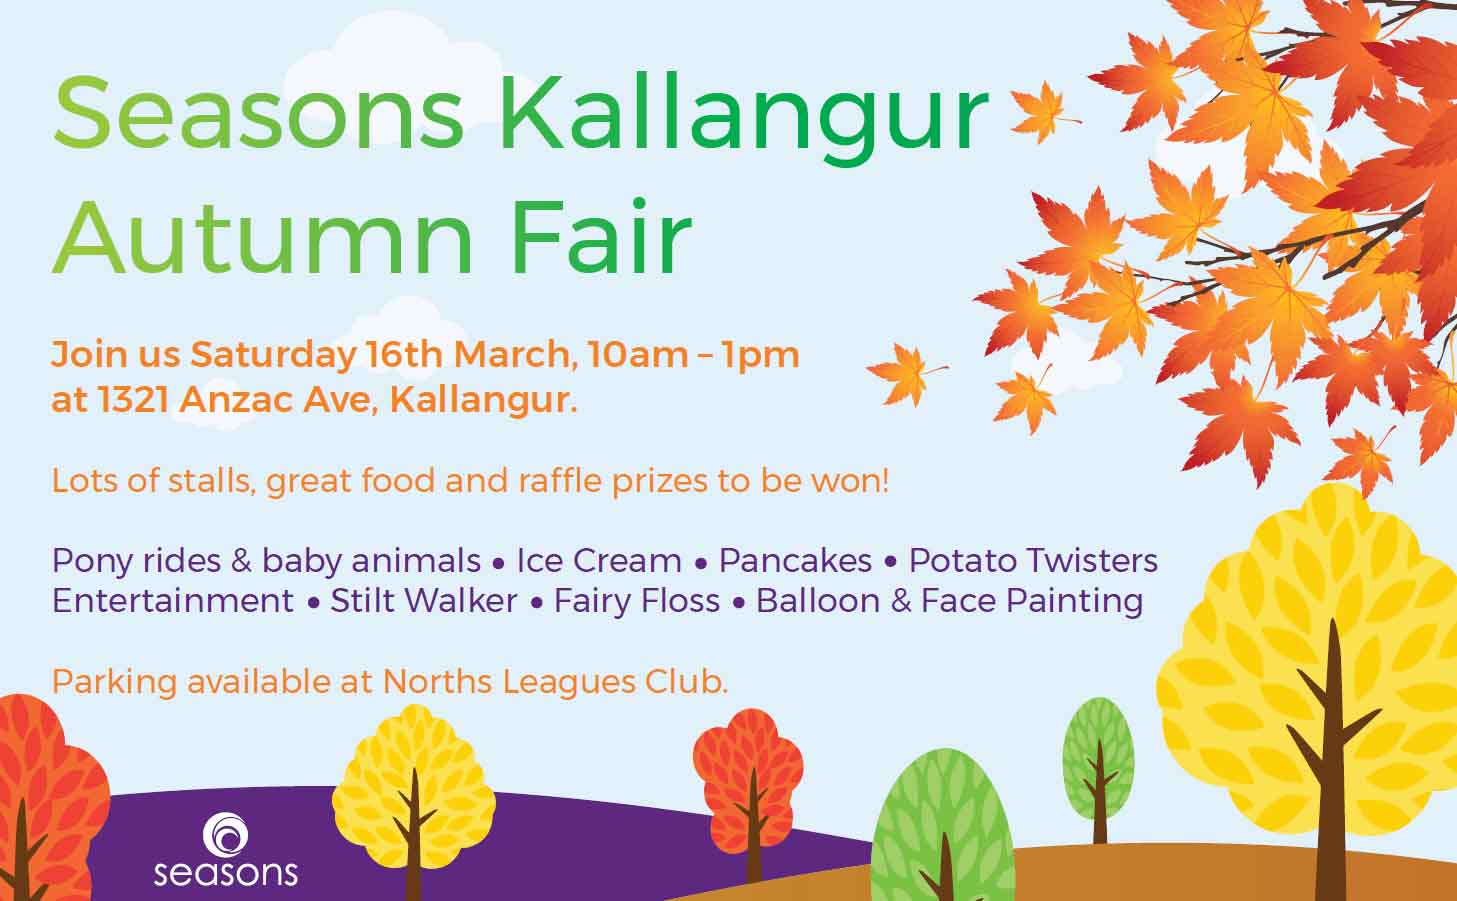 Seasons-Kallangur-Autumn-Fair1 copy